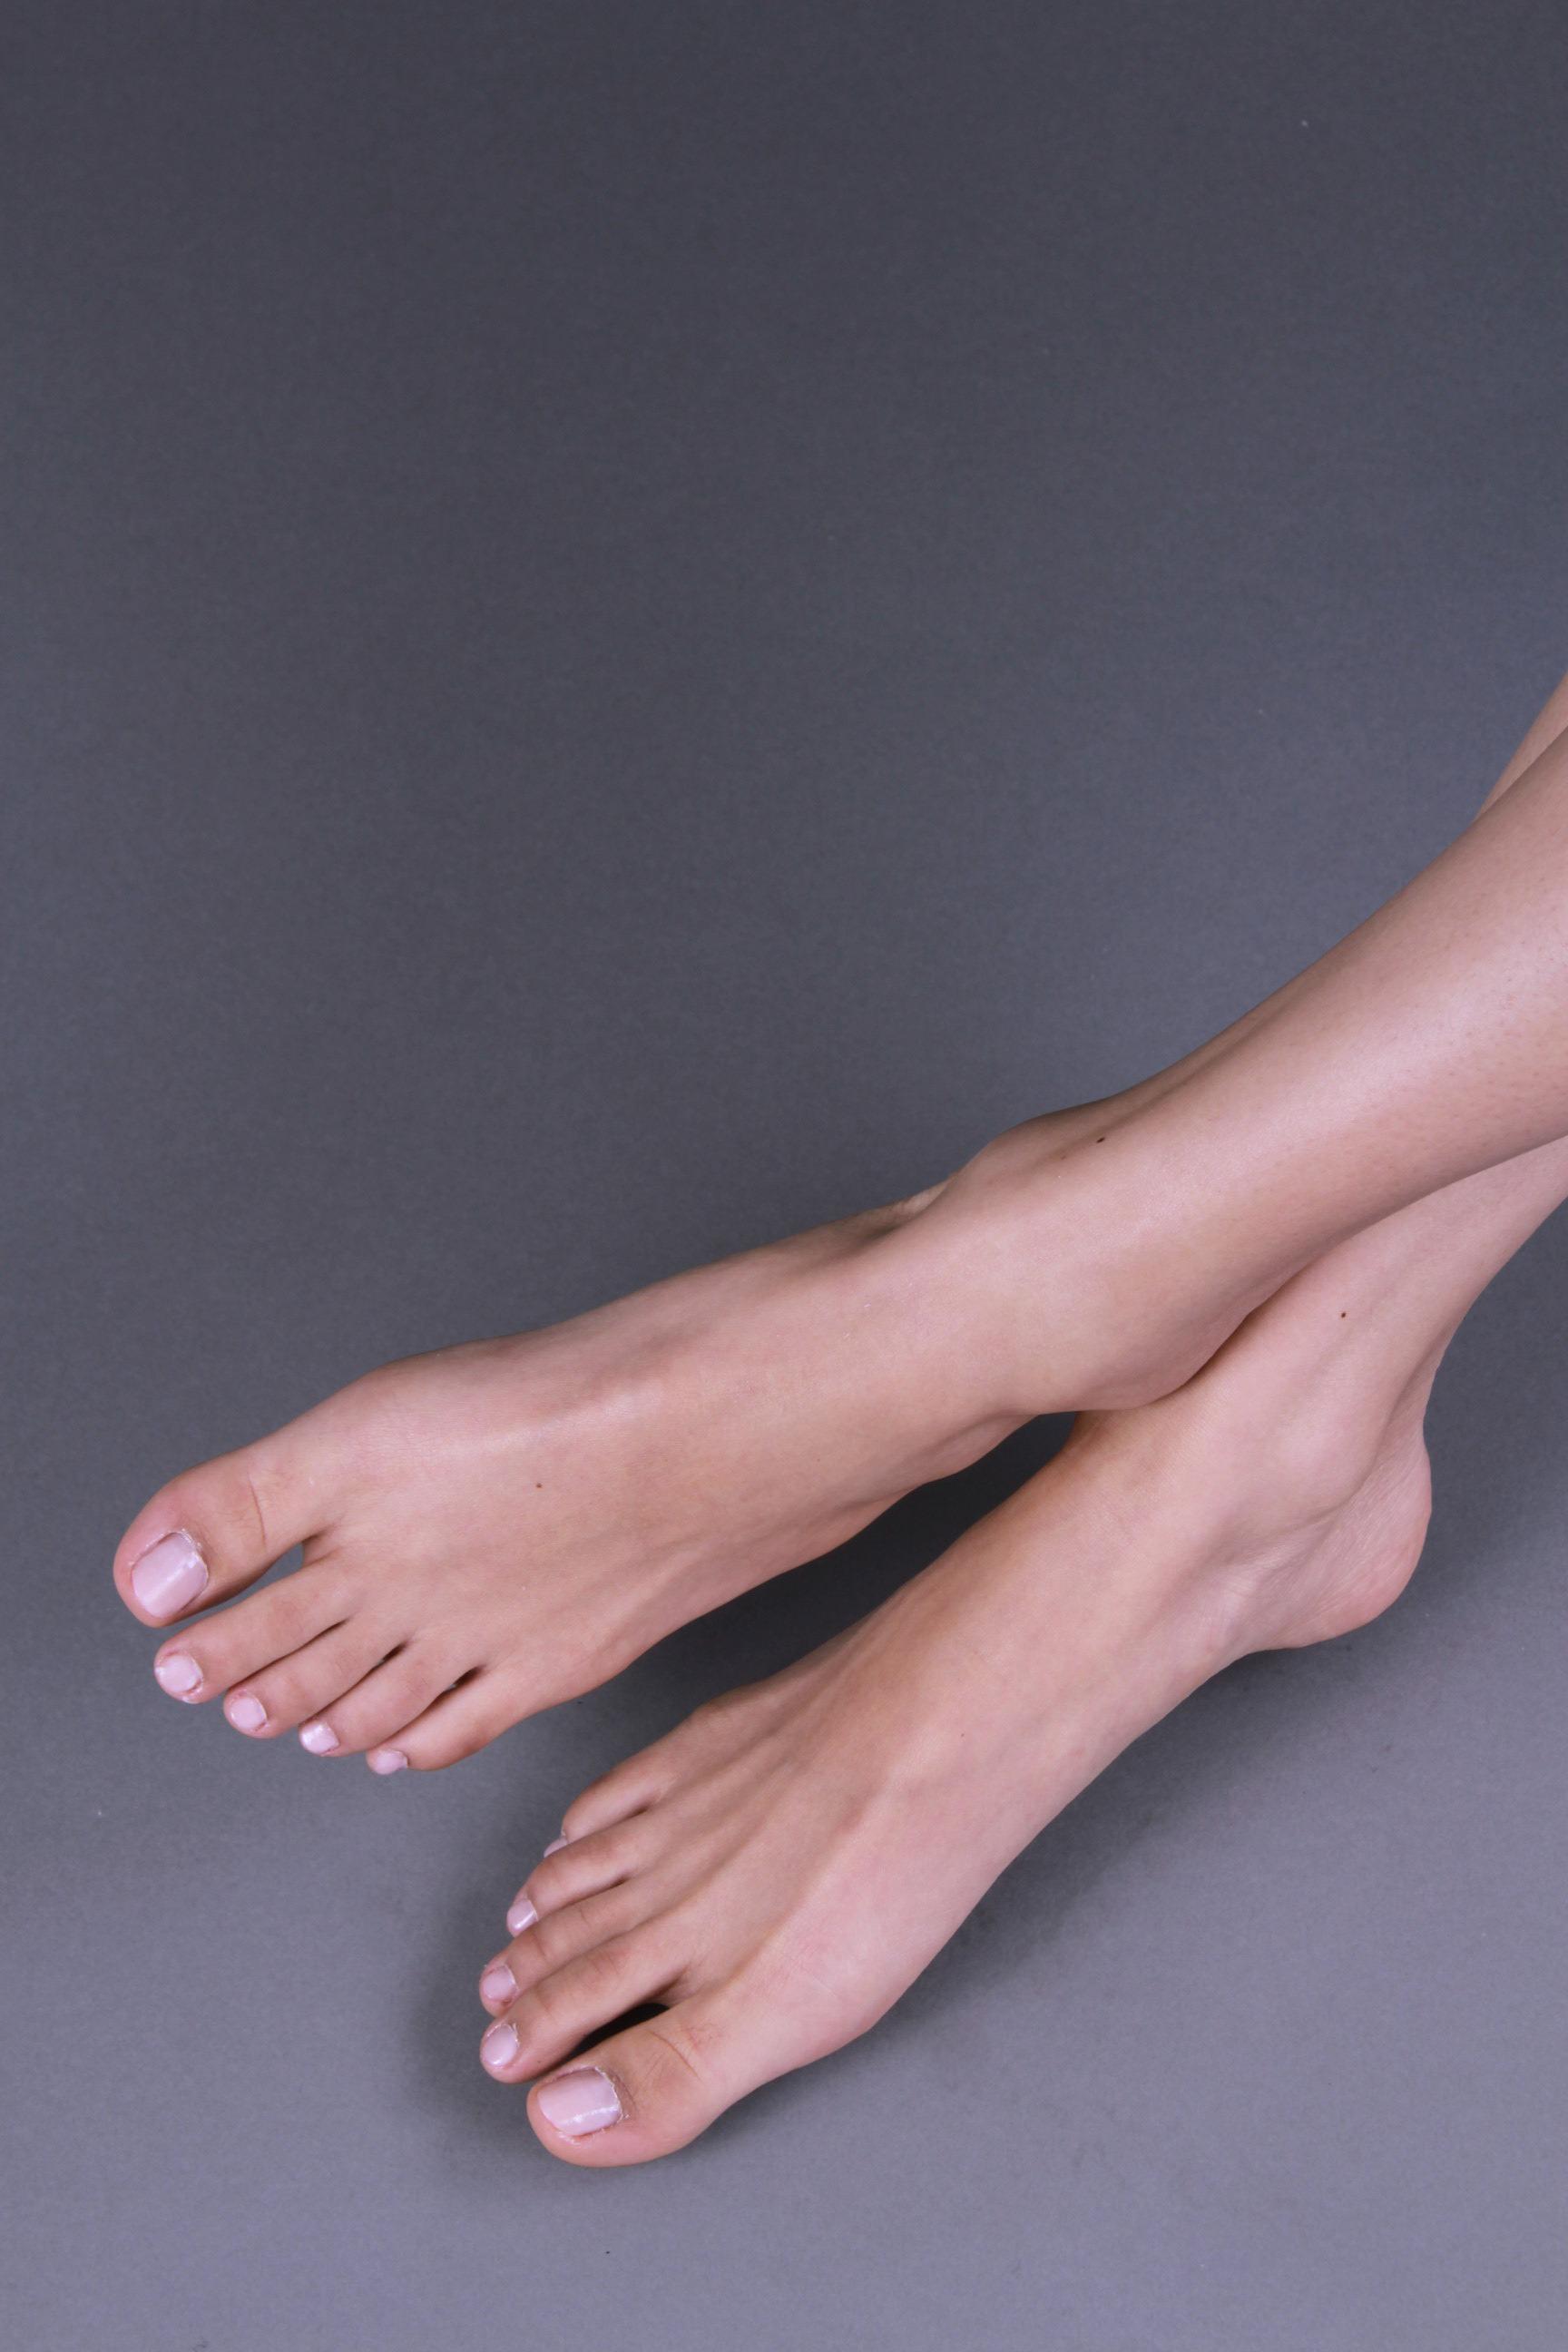 Joanne Joo__Feet2